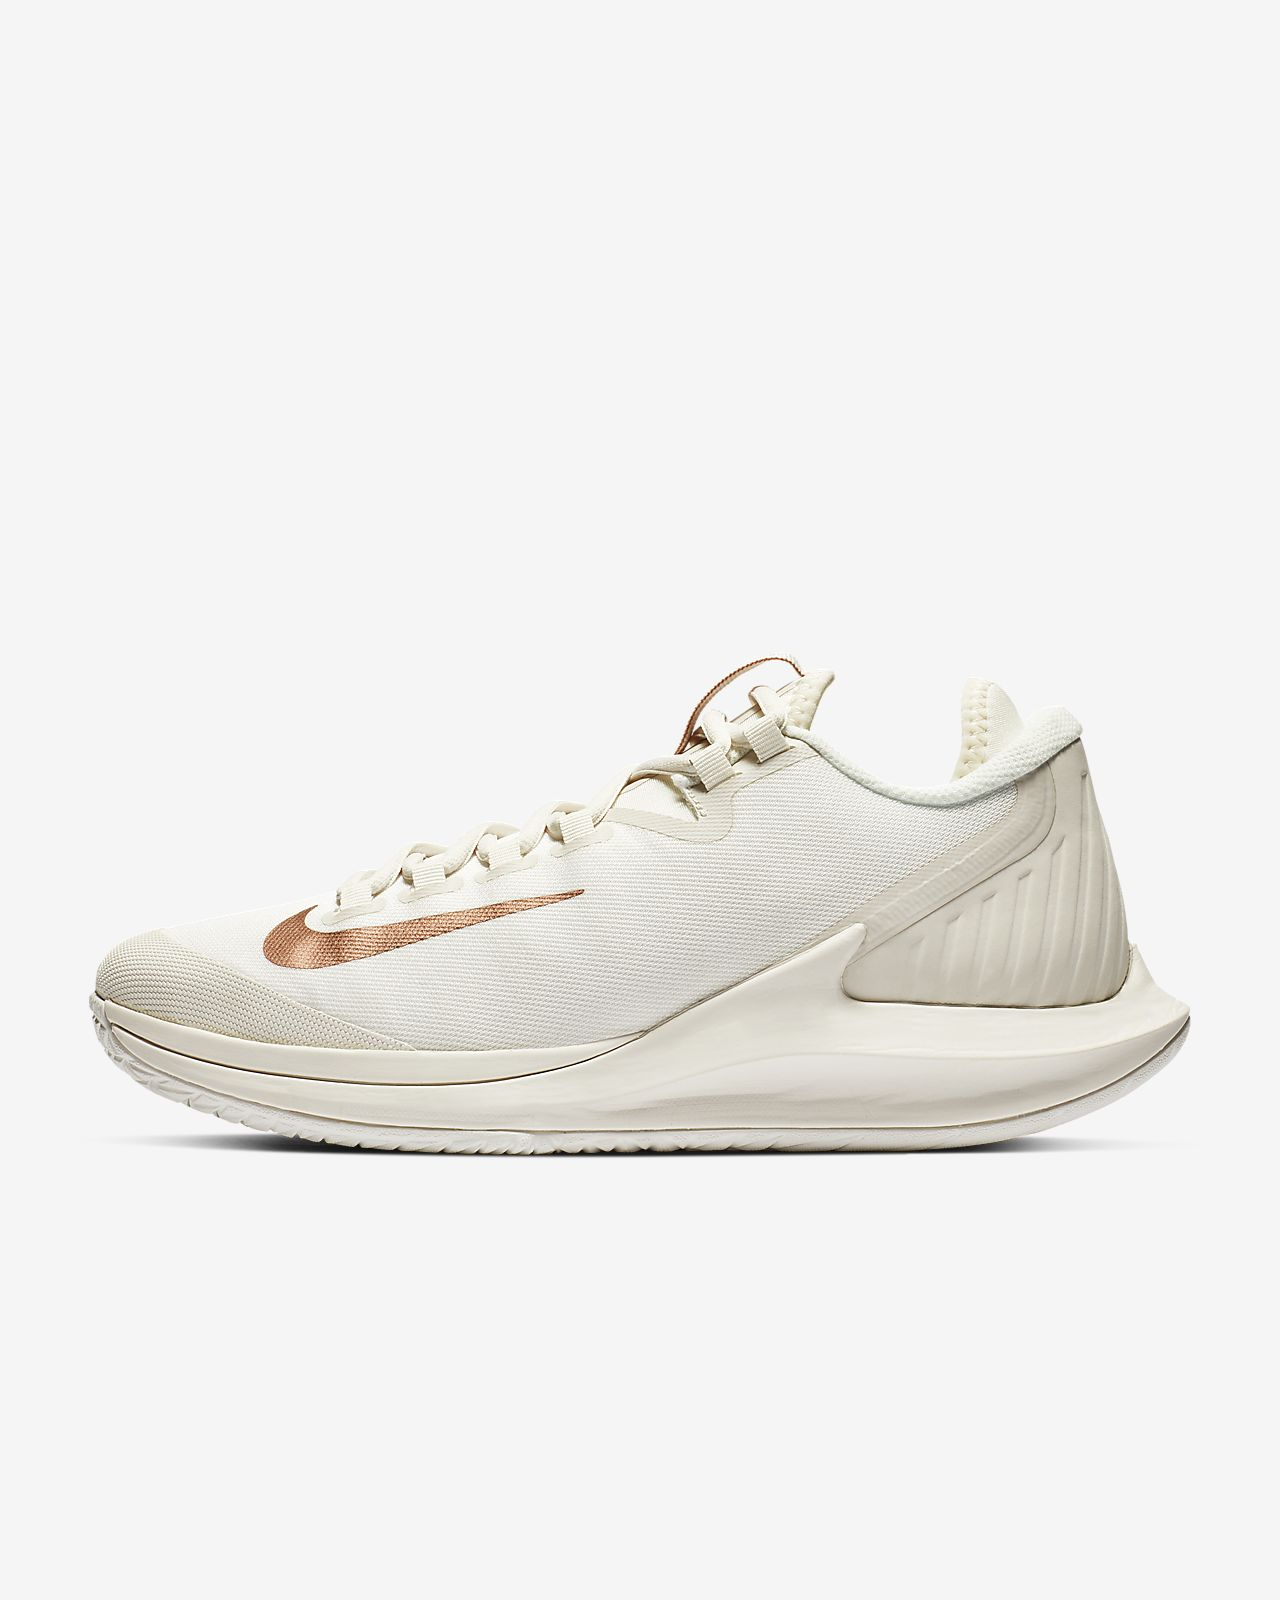 c1d8f54d97387 NikeCourt Air Zoom Zero Zapatillas de tenis - Mujer. Nike.com ES